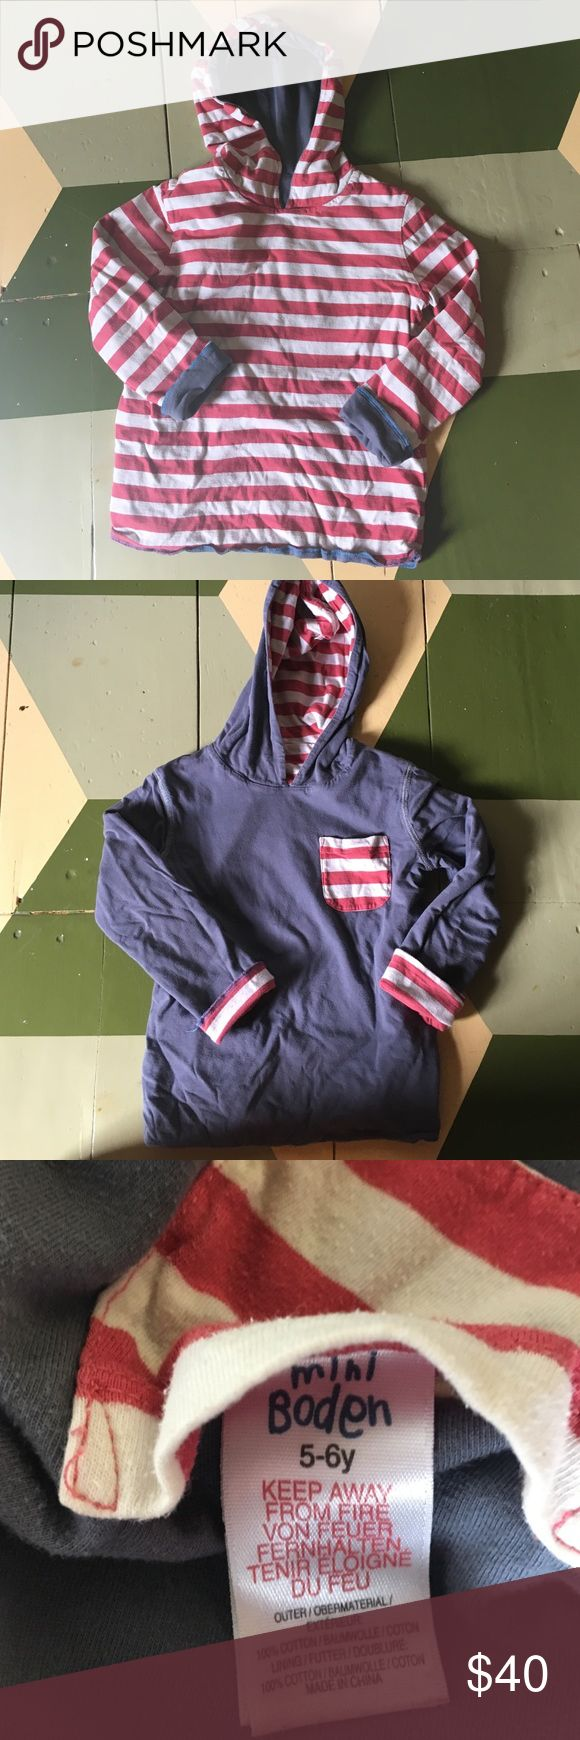 Mini Boden Boys reversible hoodie Sz 5-6 Adorable mini Boden boys hoodie, reversible with red and white stripes or gray depending on side worn Mini Boden Shirts & Tops Sweatshirts & Hoodies